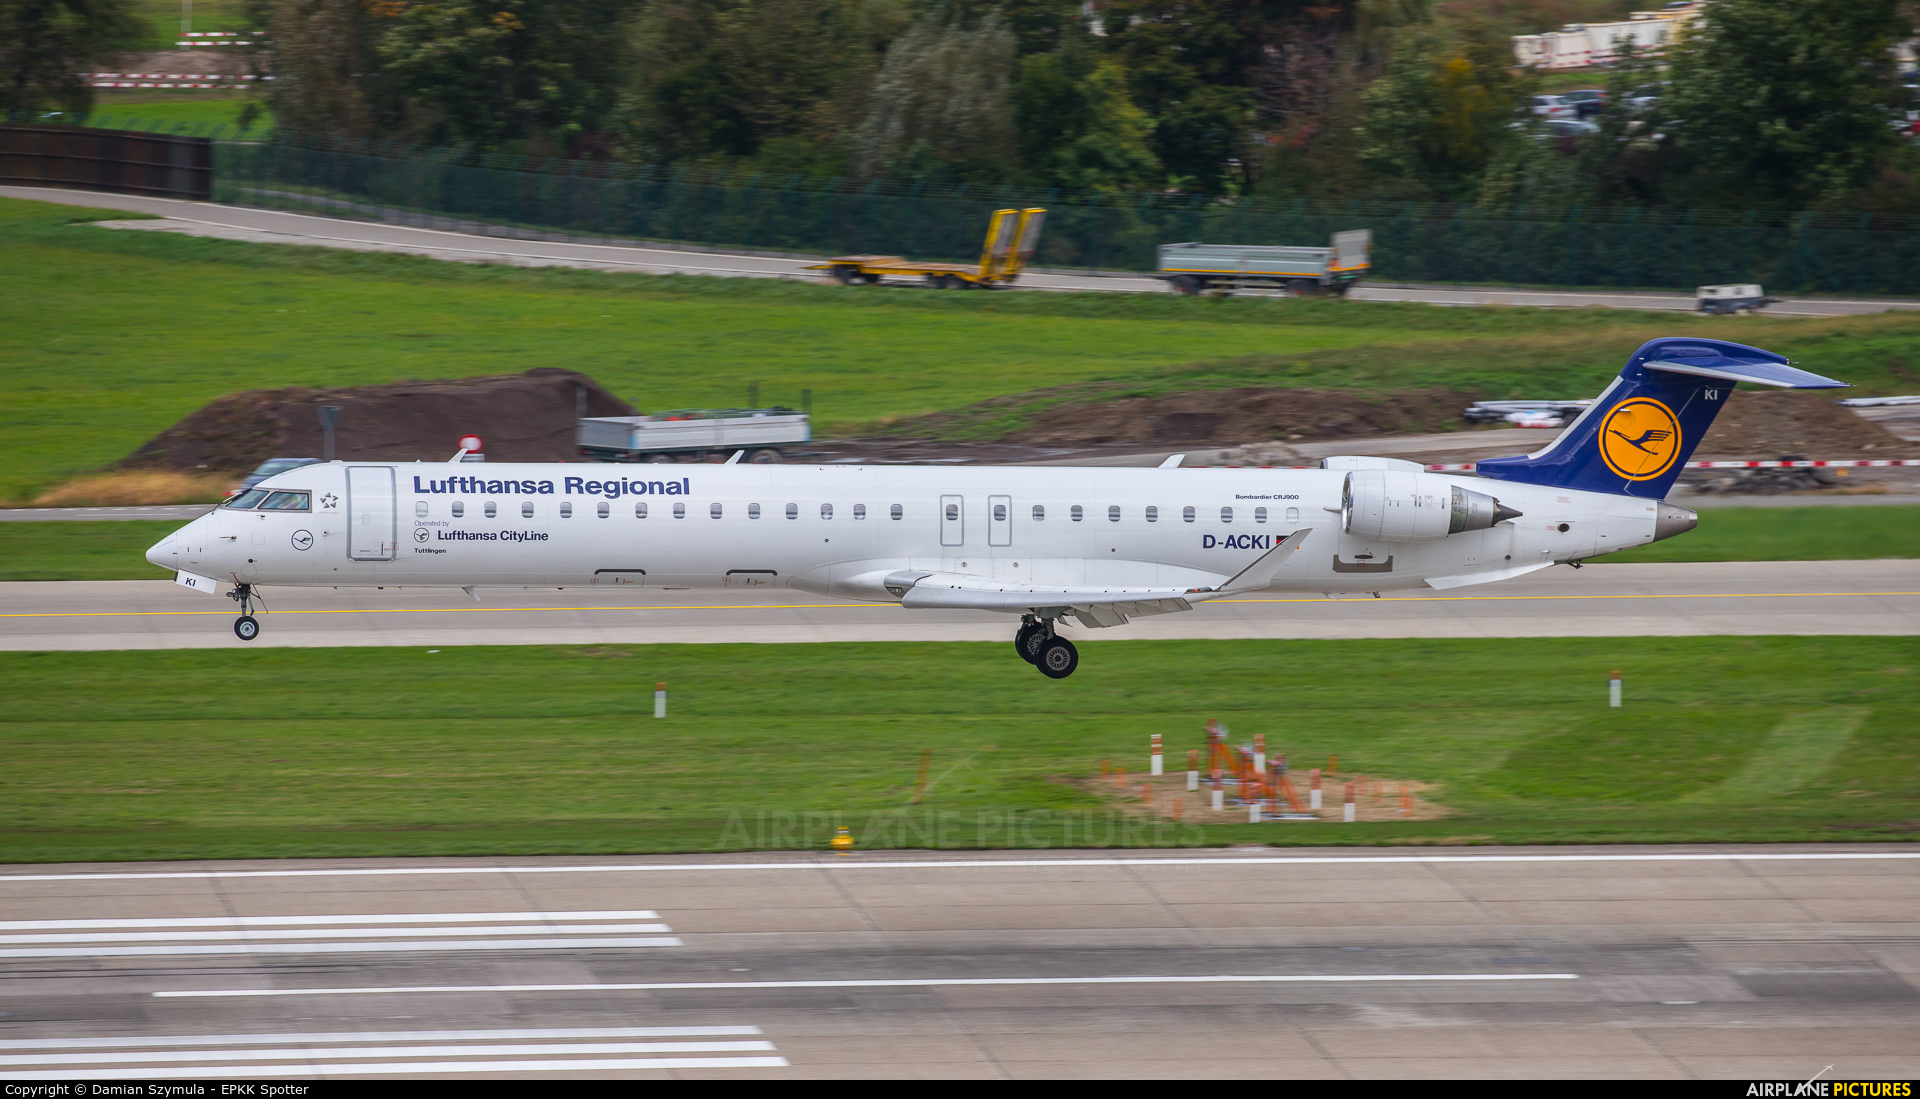 Lufthansa Regional - CityLine D-ACKI aircraft at Zurich